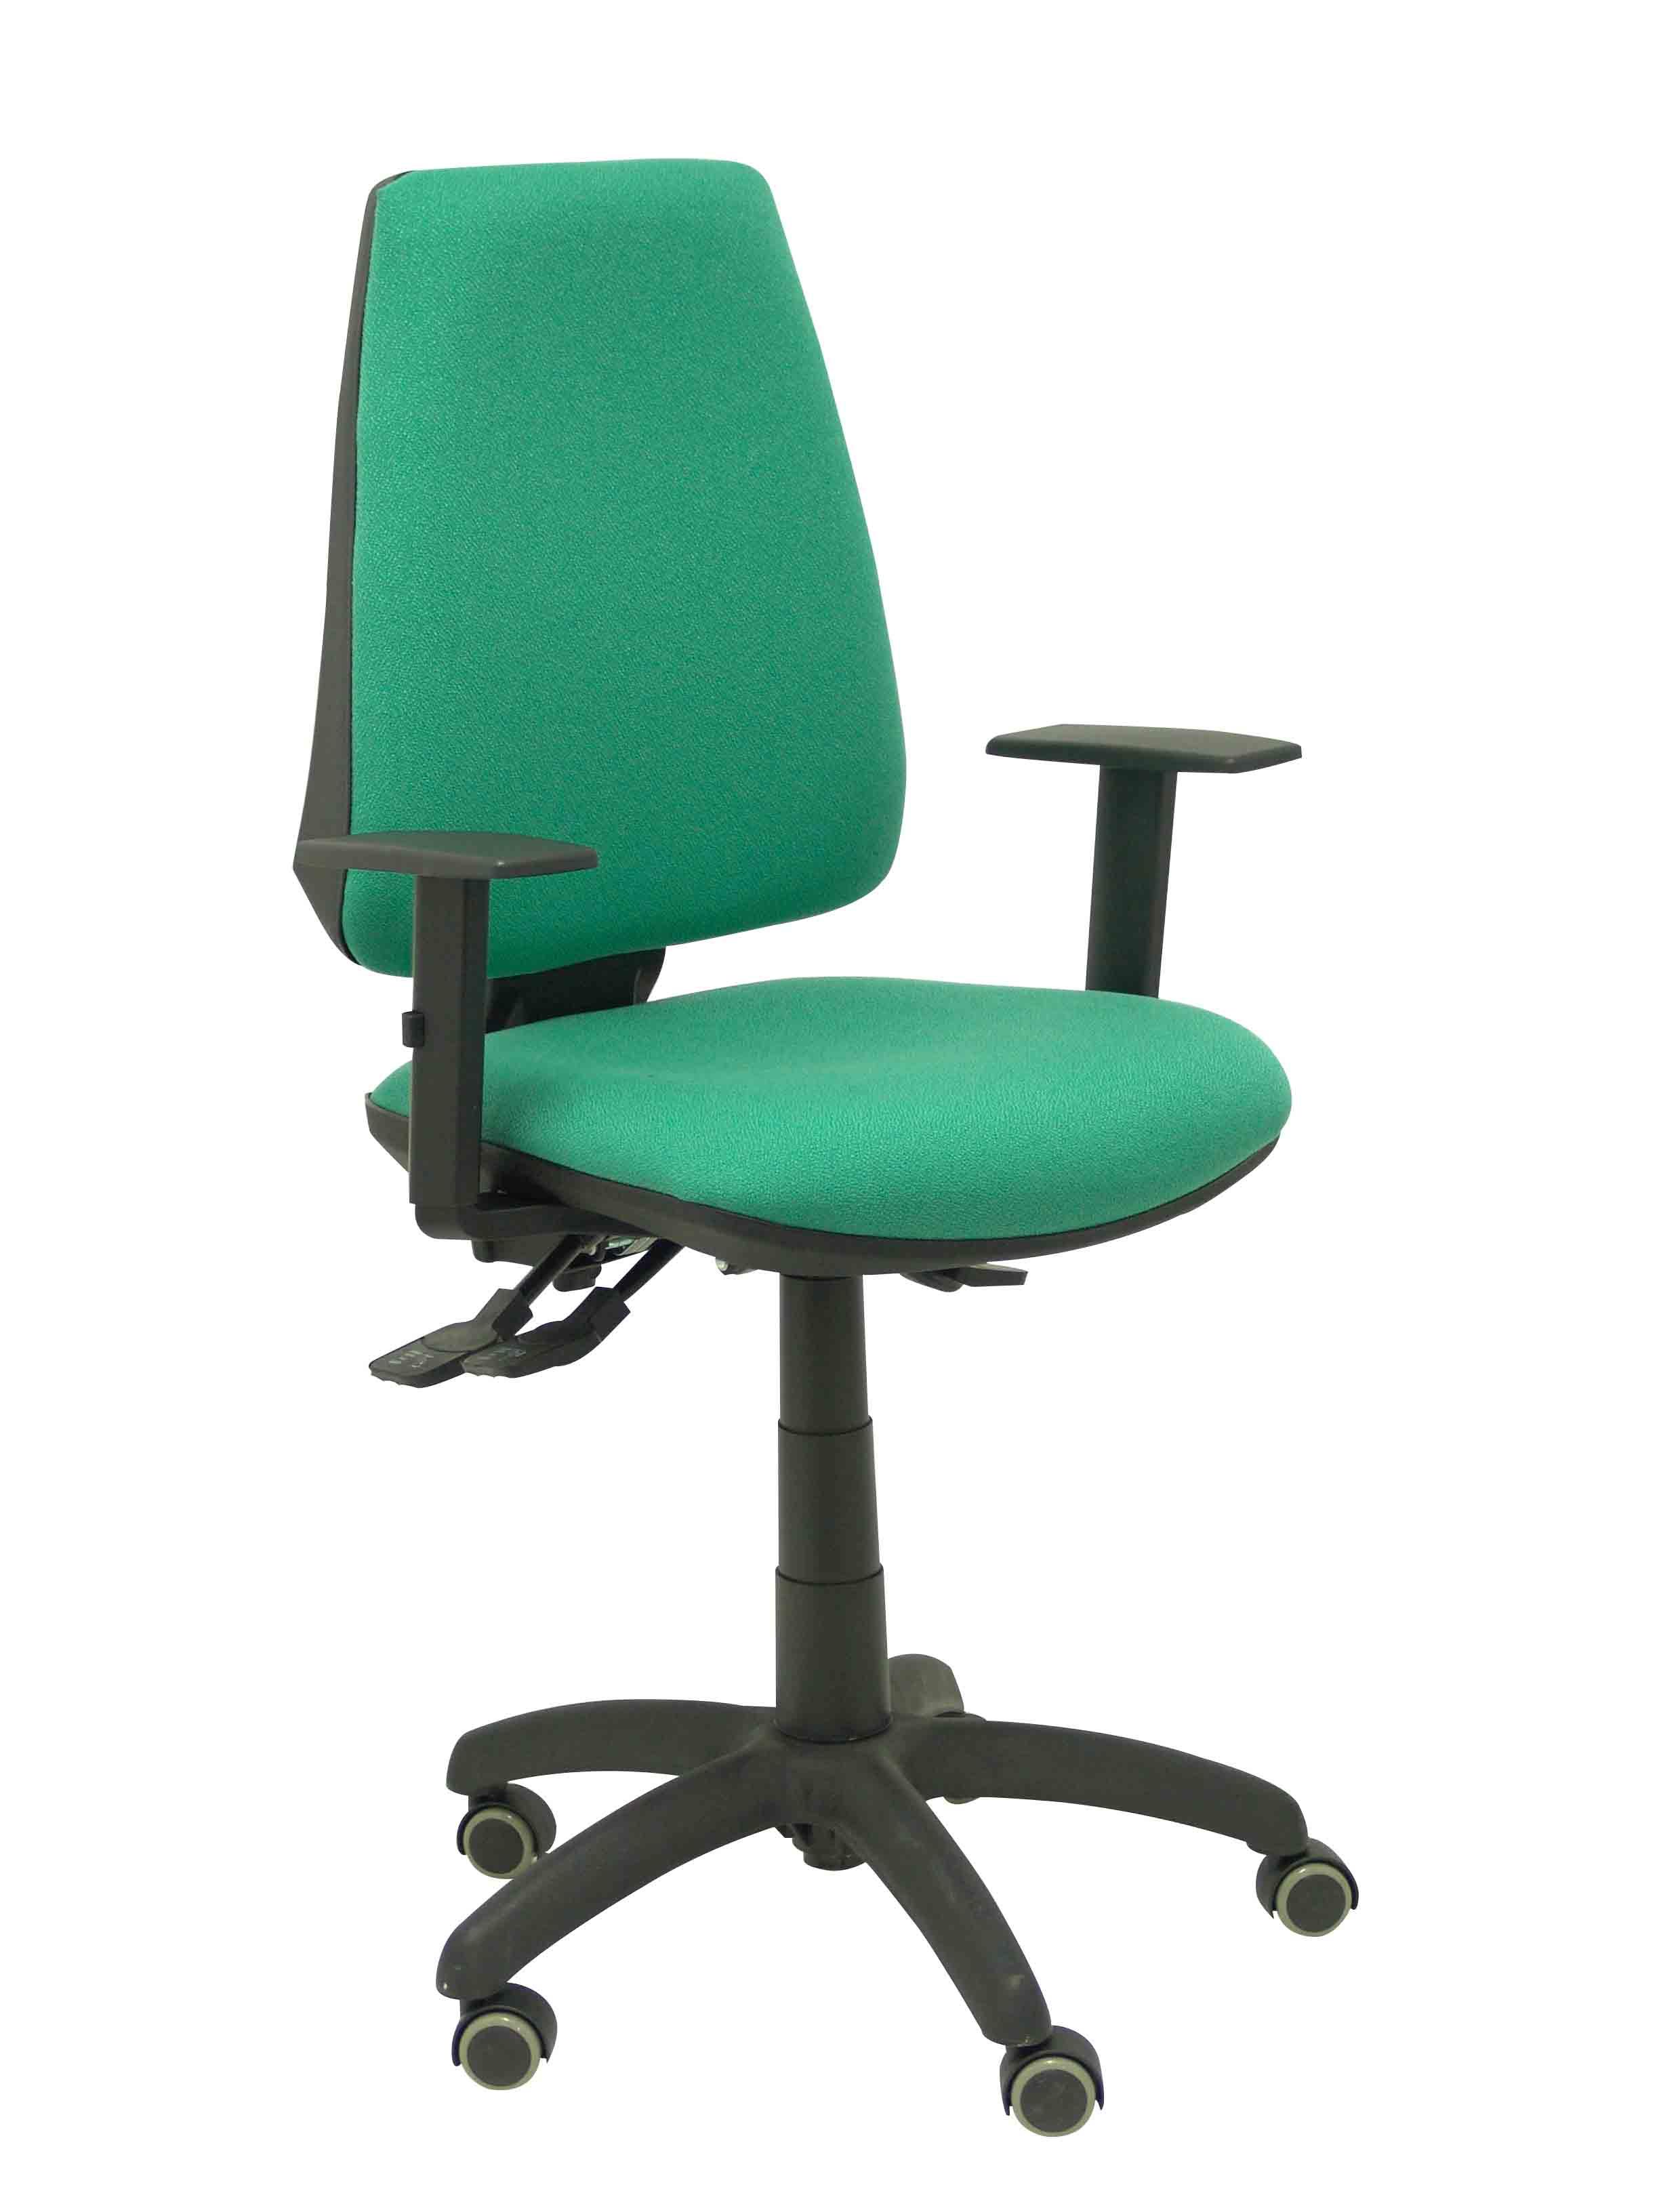 Silla Elche S bali verde brazos regulables ruedas de parquet